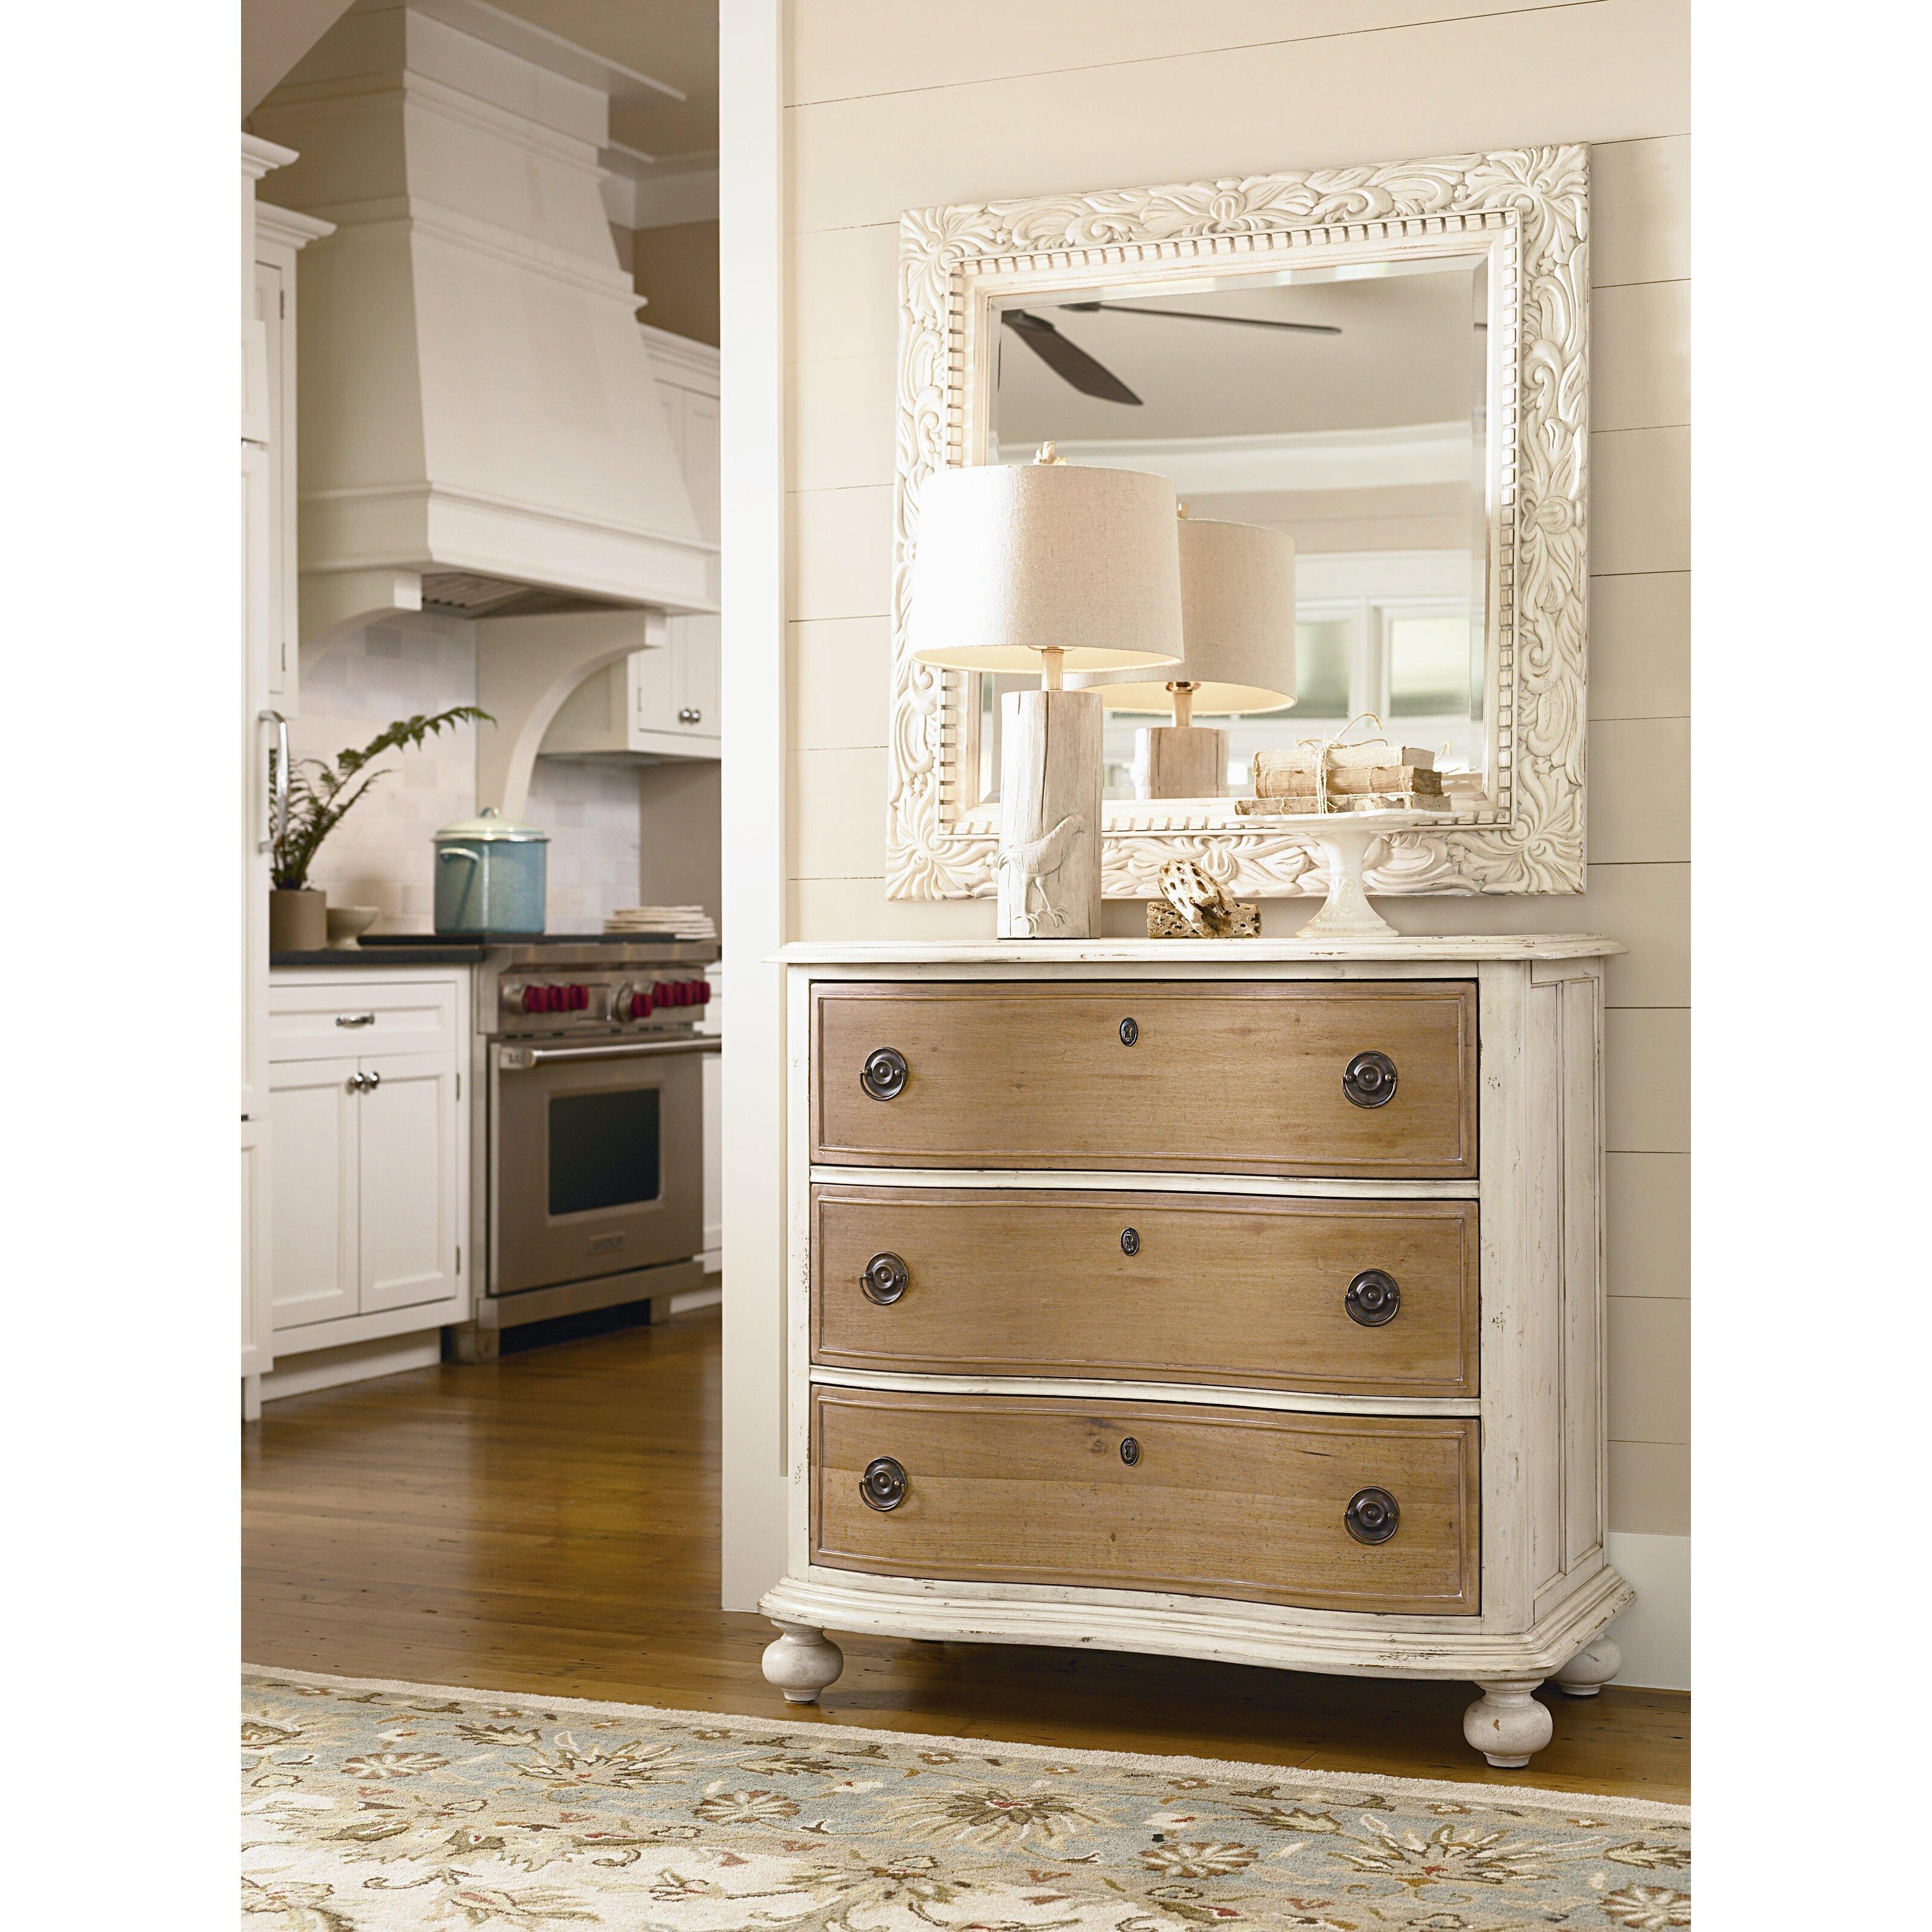 Paula Deen Down Home Bedroom: Paula Deen Home Down Home 3 Drawer Chest & Reviews